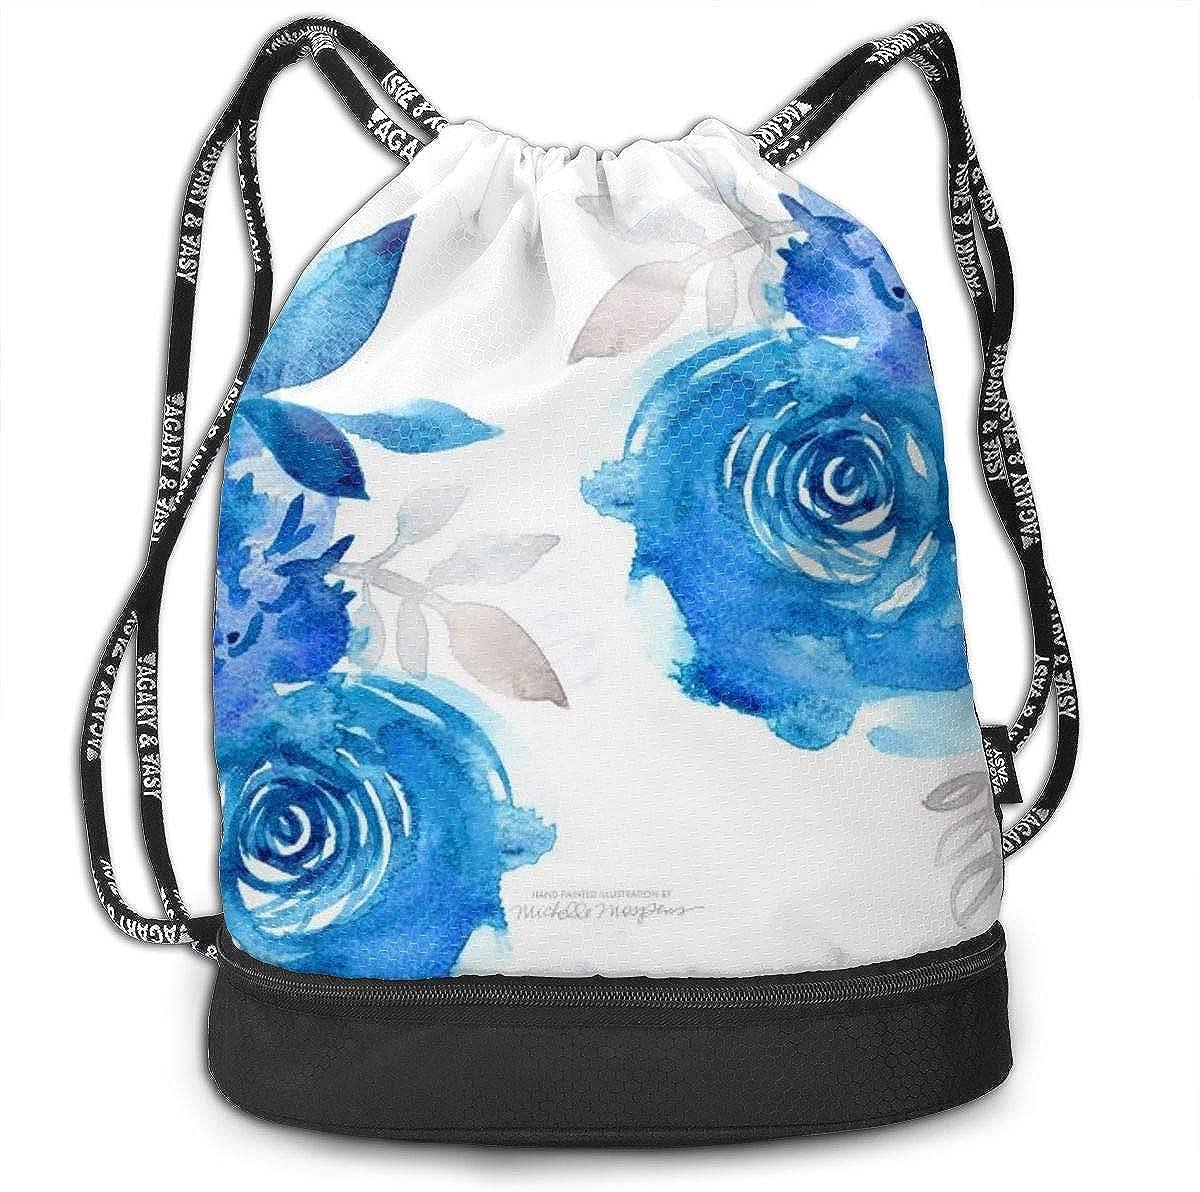 Cute Magic Cube Art Drawstring Bag For Girls /& Boys Gym Yoga Runner Sports Daypack Portable Bundle Backpack